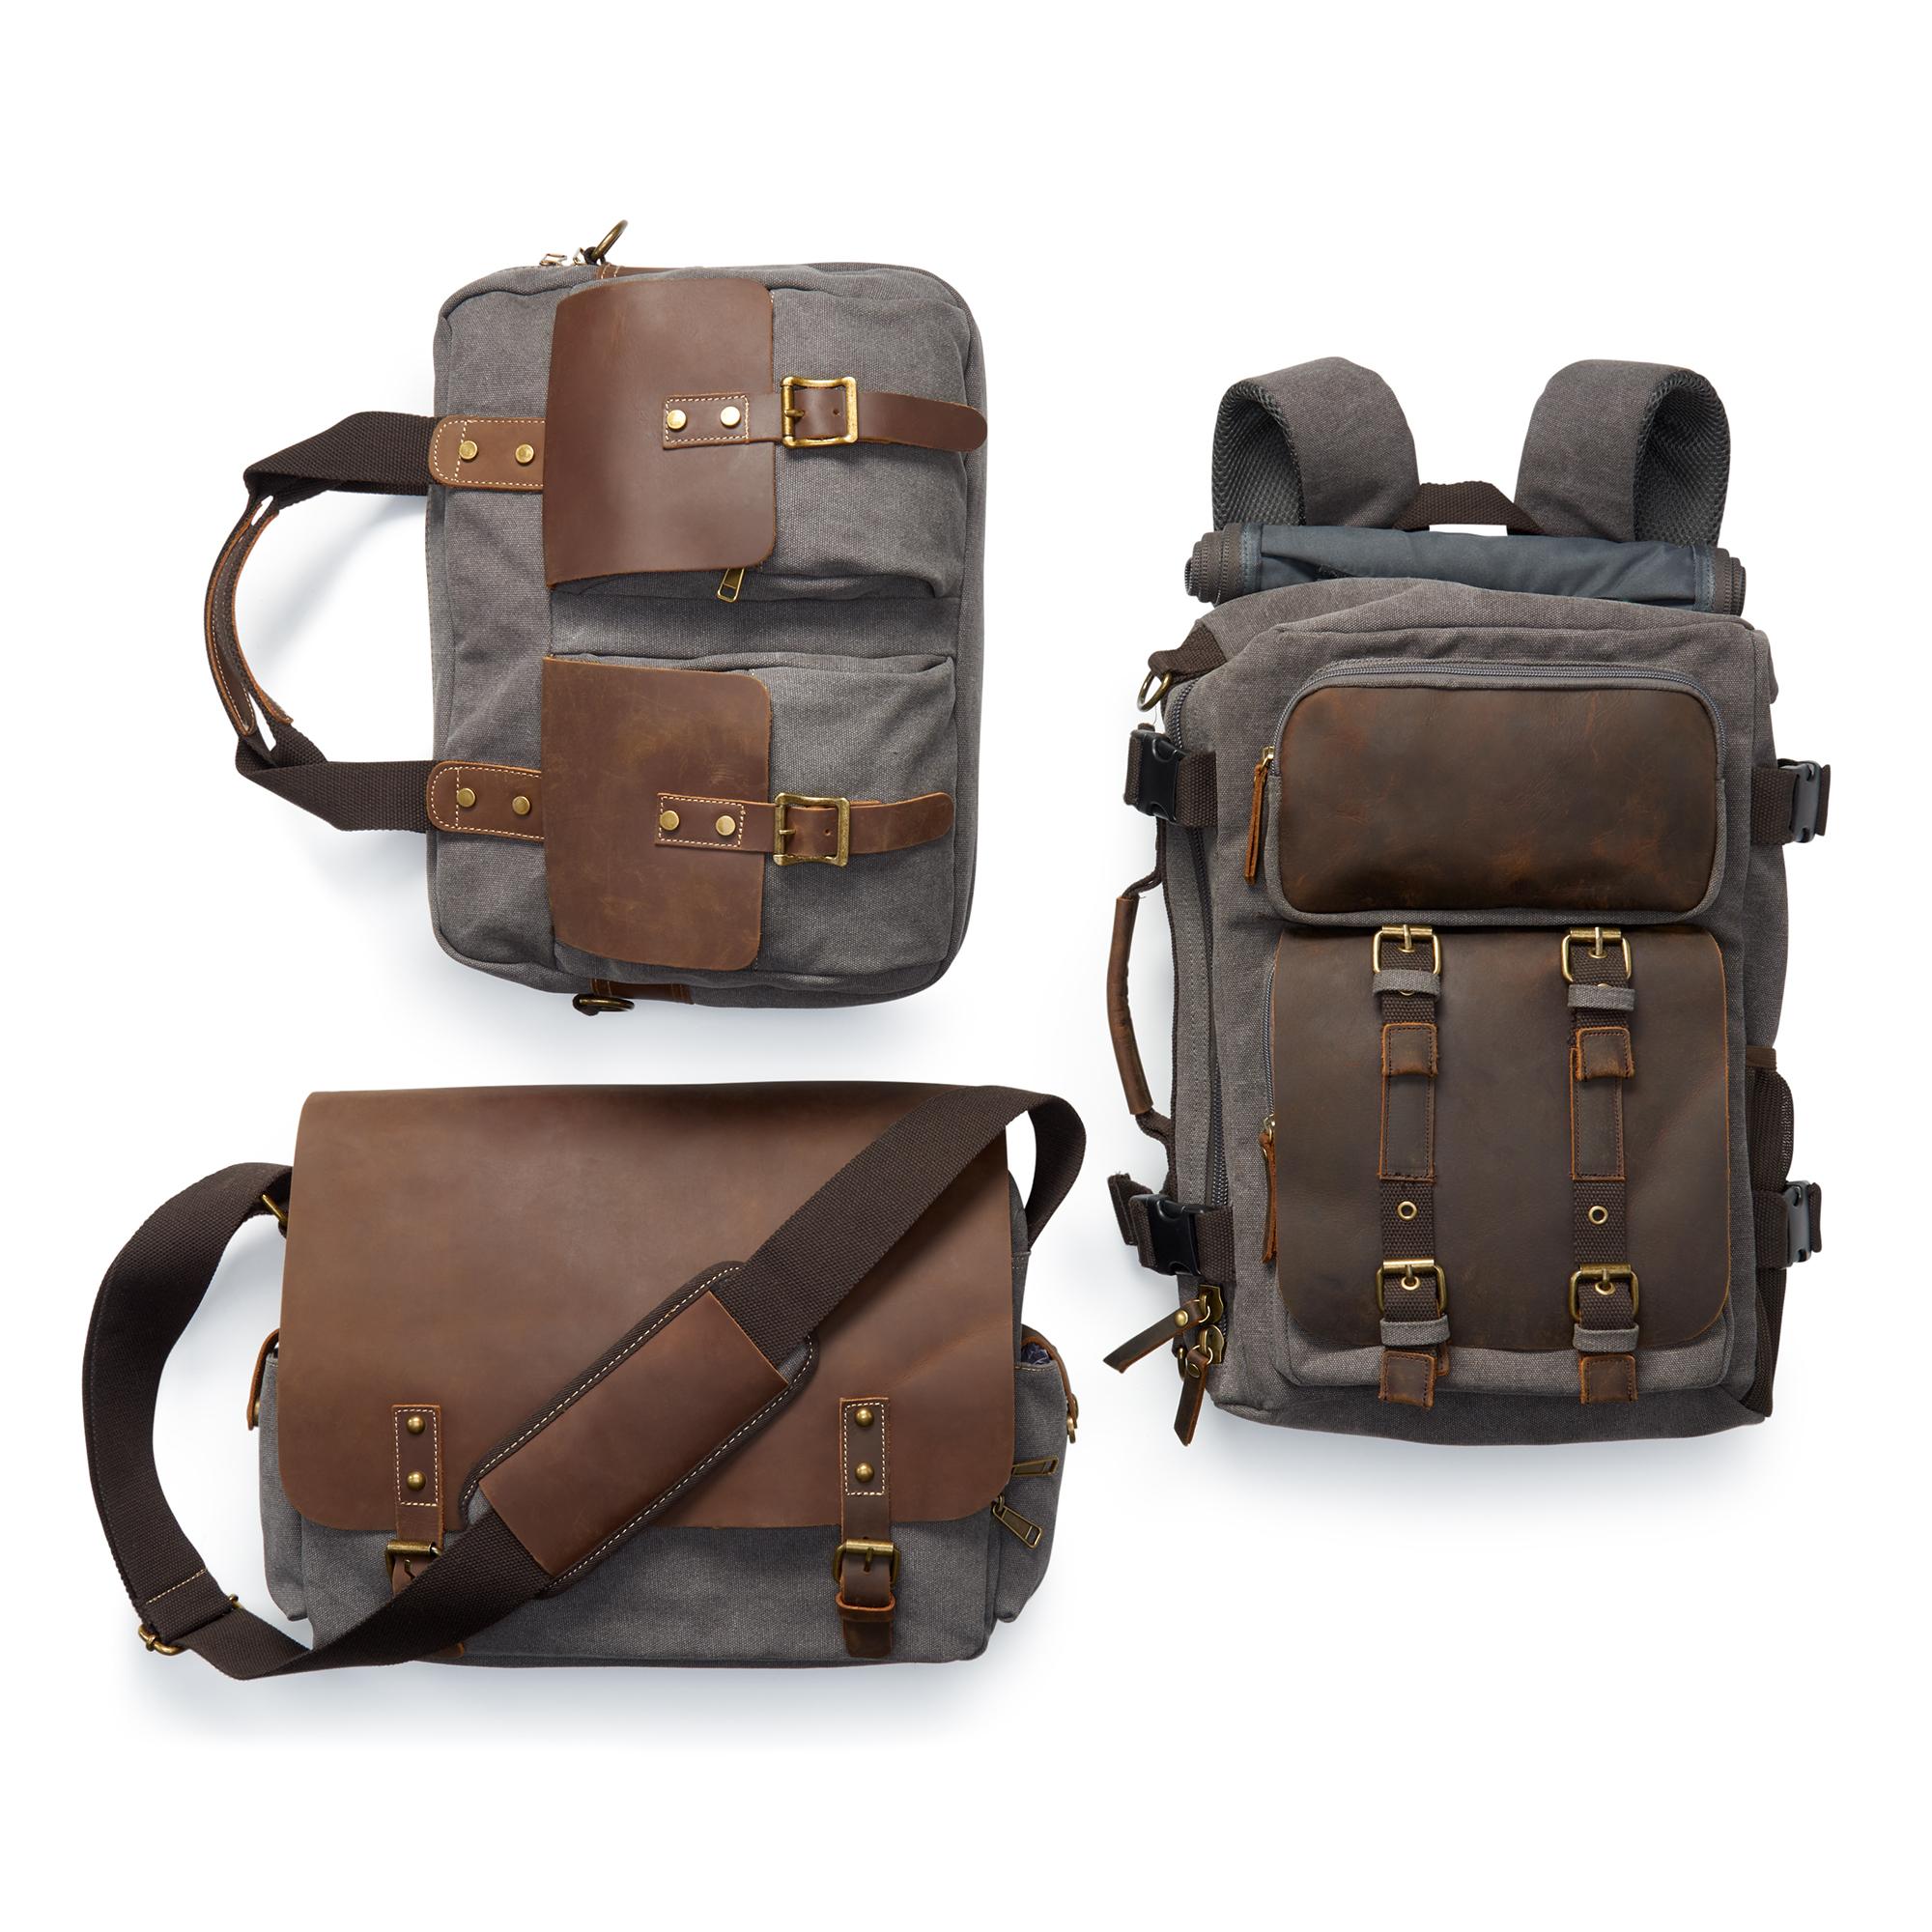 3c3c05d8e443 Amazon.com  Wilsons Leather  Backpacks